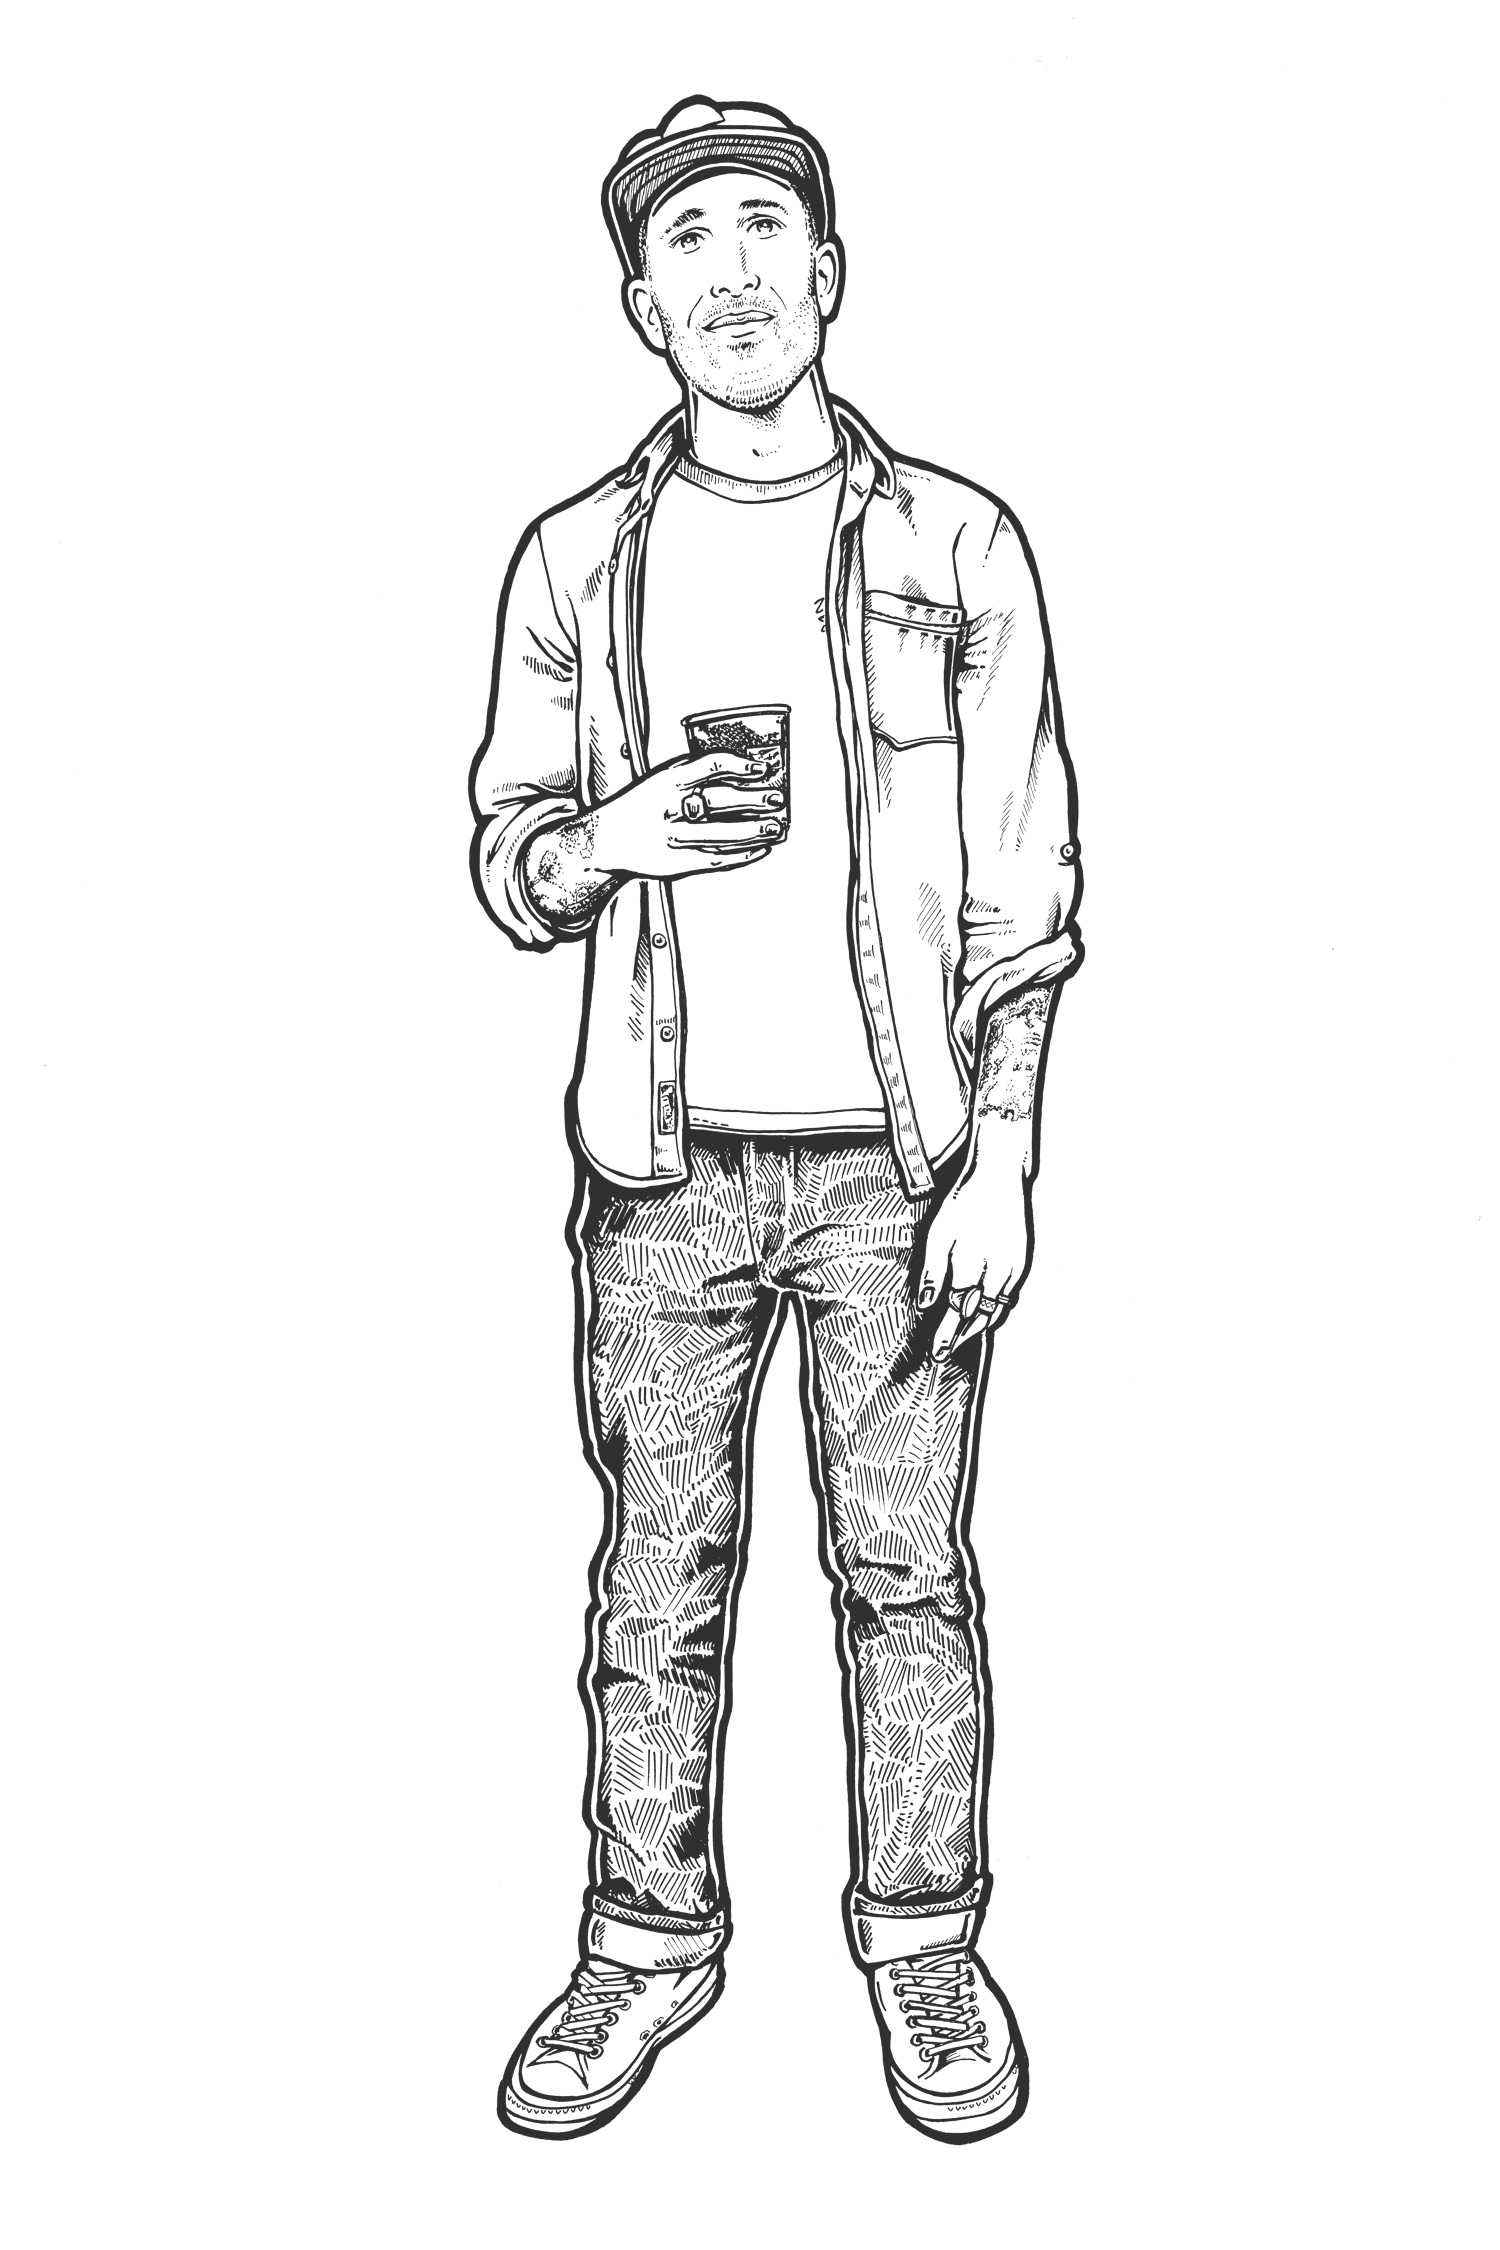 illustration-benny-gold-drawn-by-adam-pointer.jpg